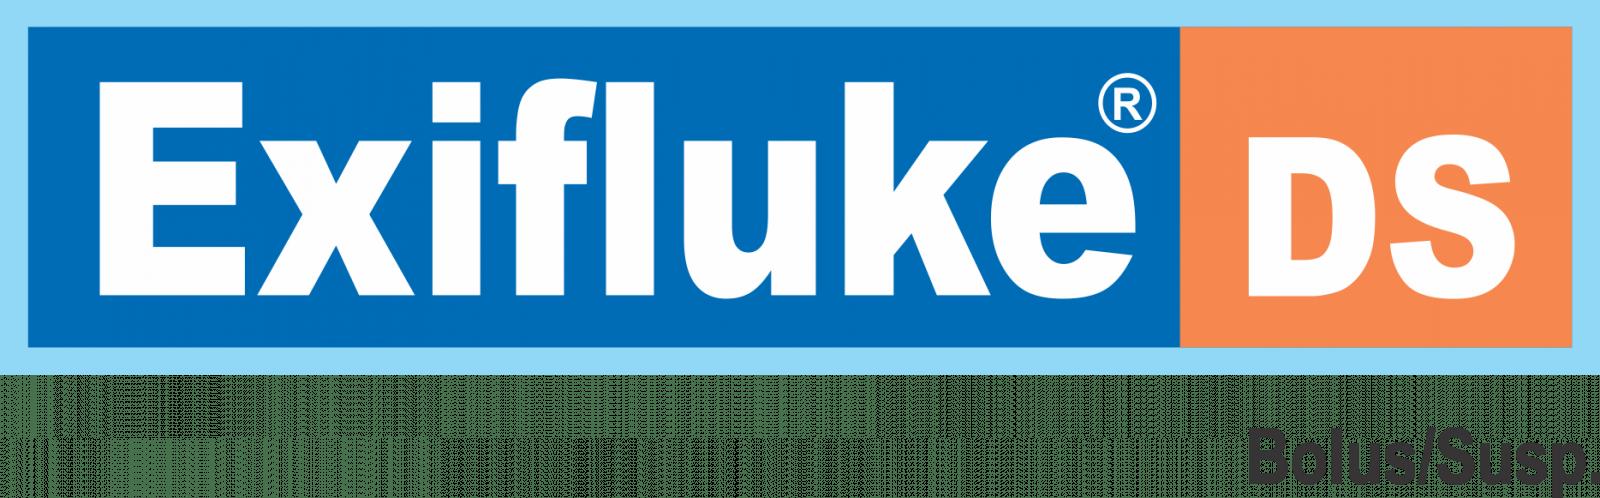 Exifluk_DS